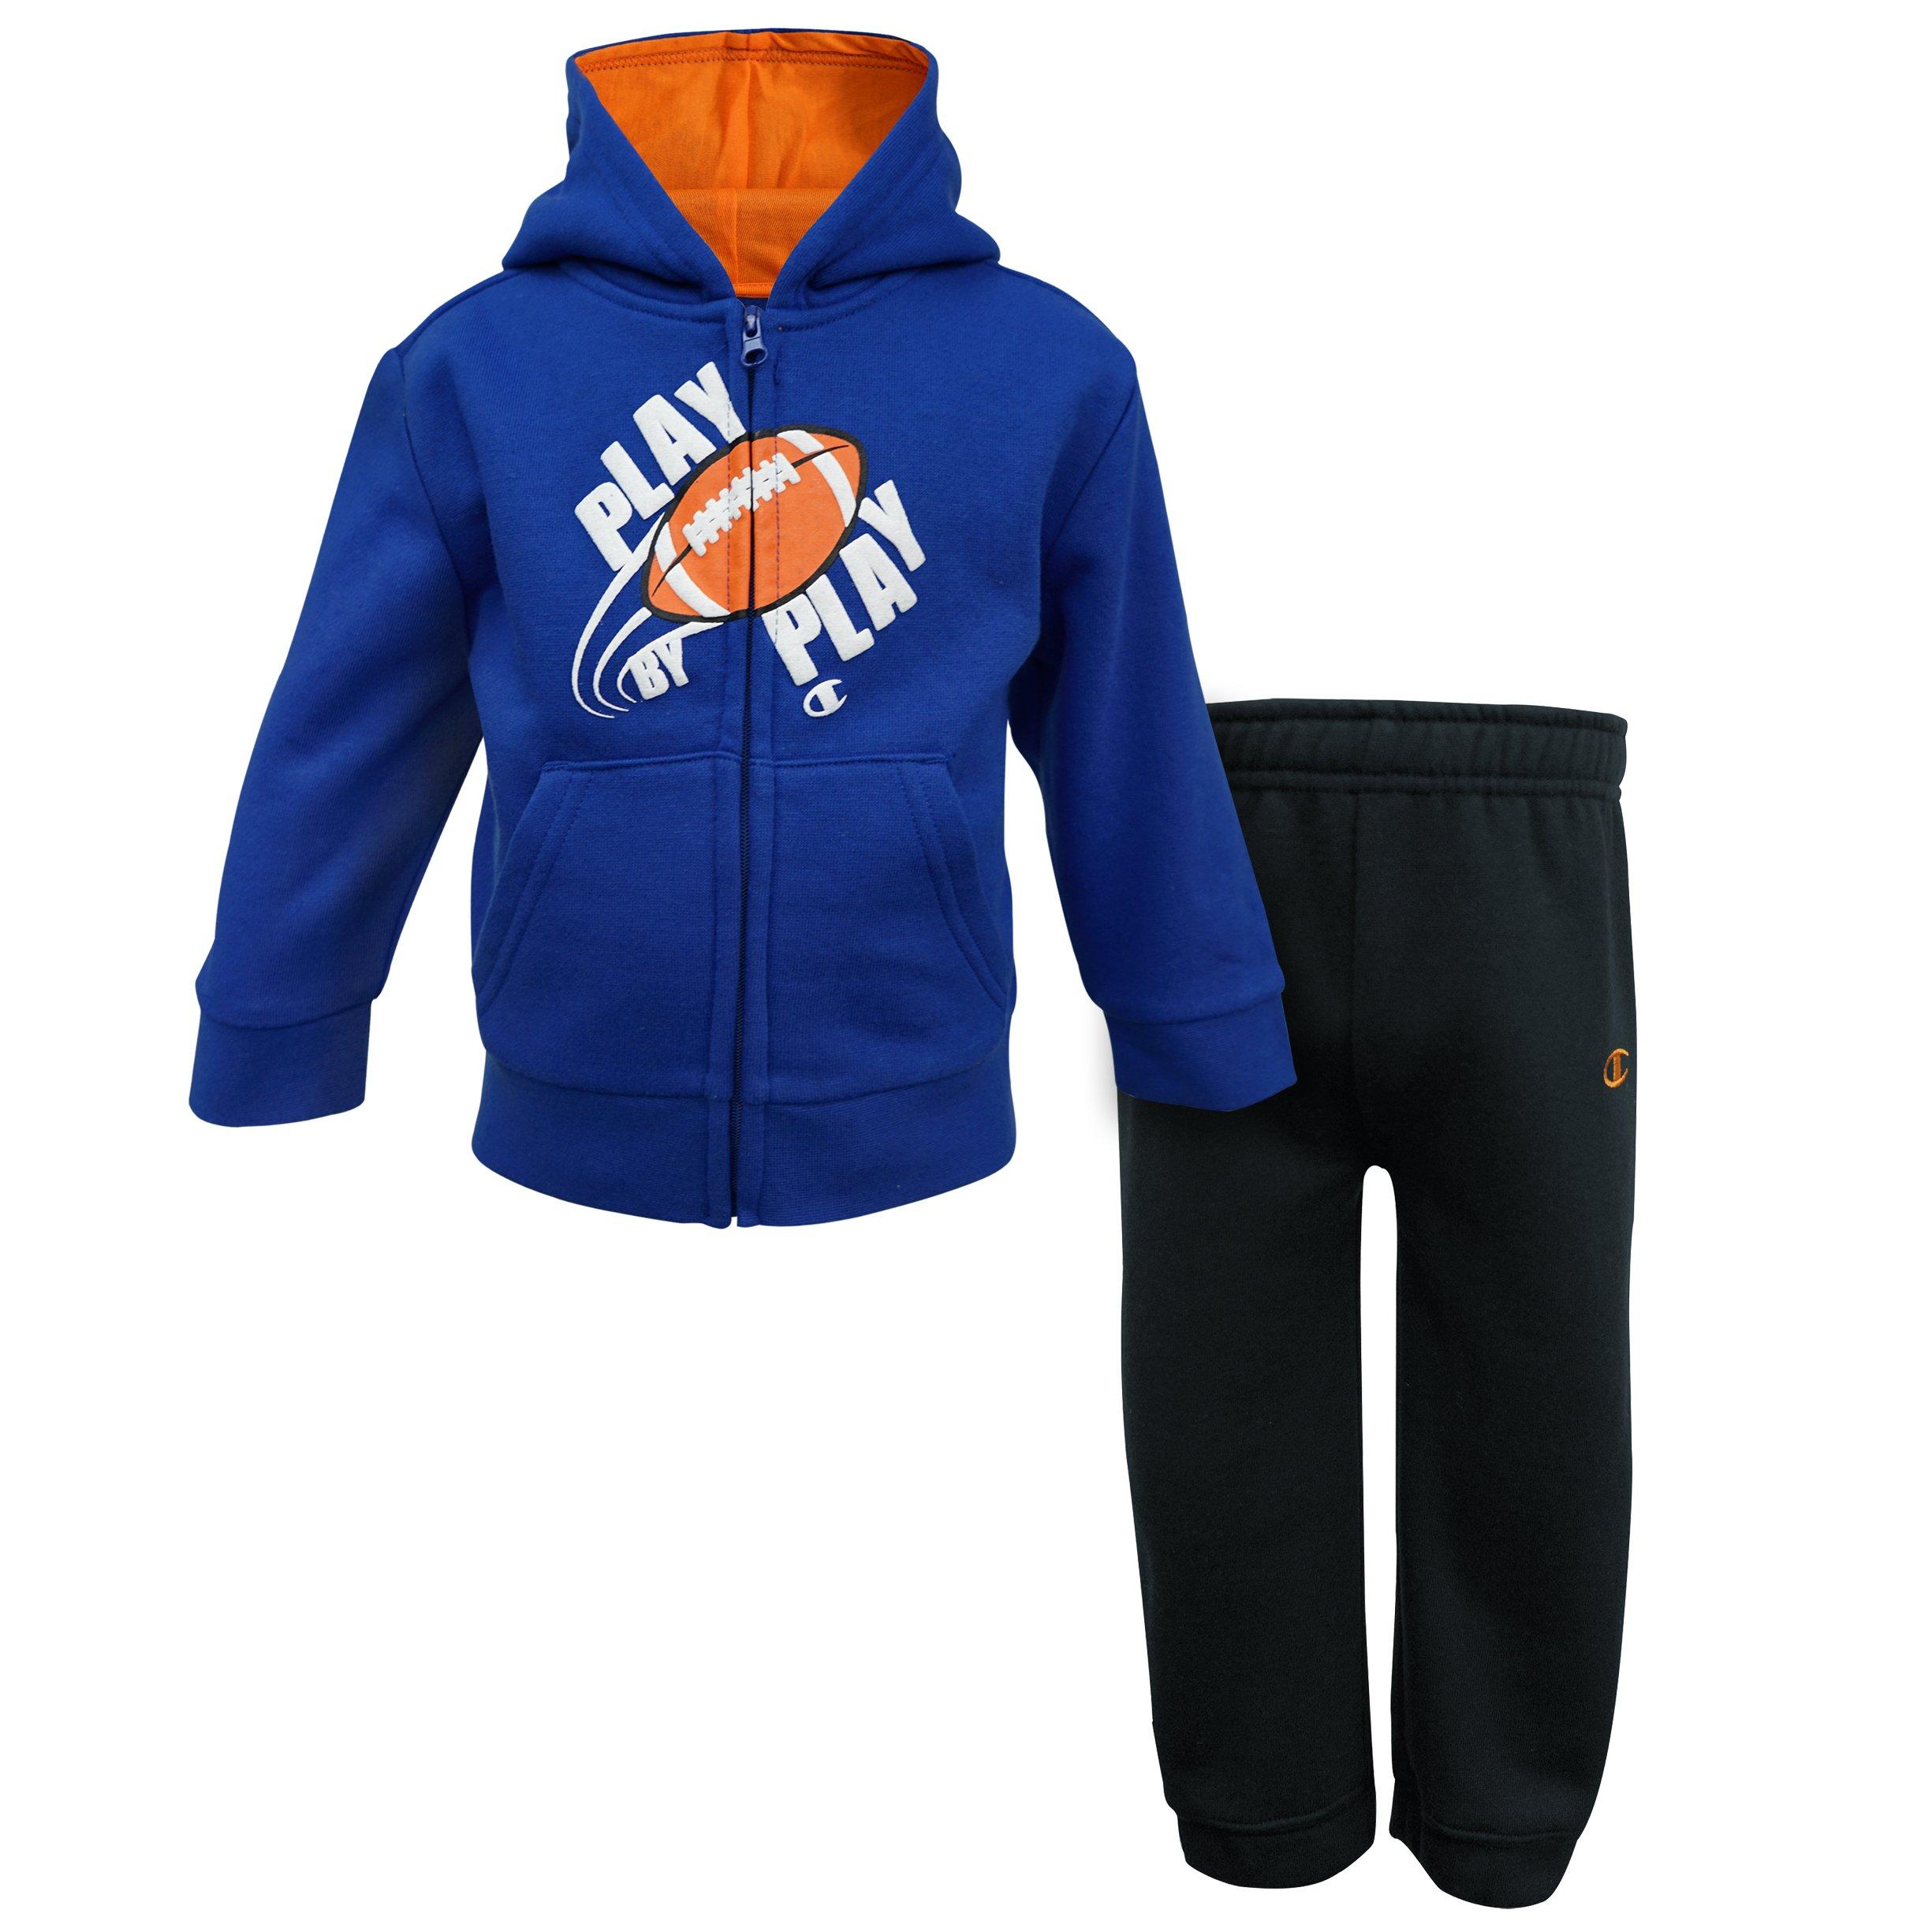 Champion Baby Boys Hooded Fleece Sets (12M, Football Blue/Black) by Champion